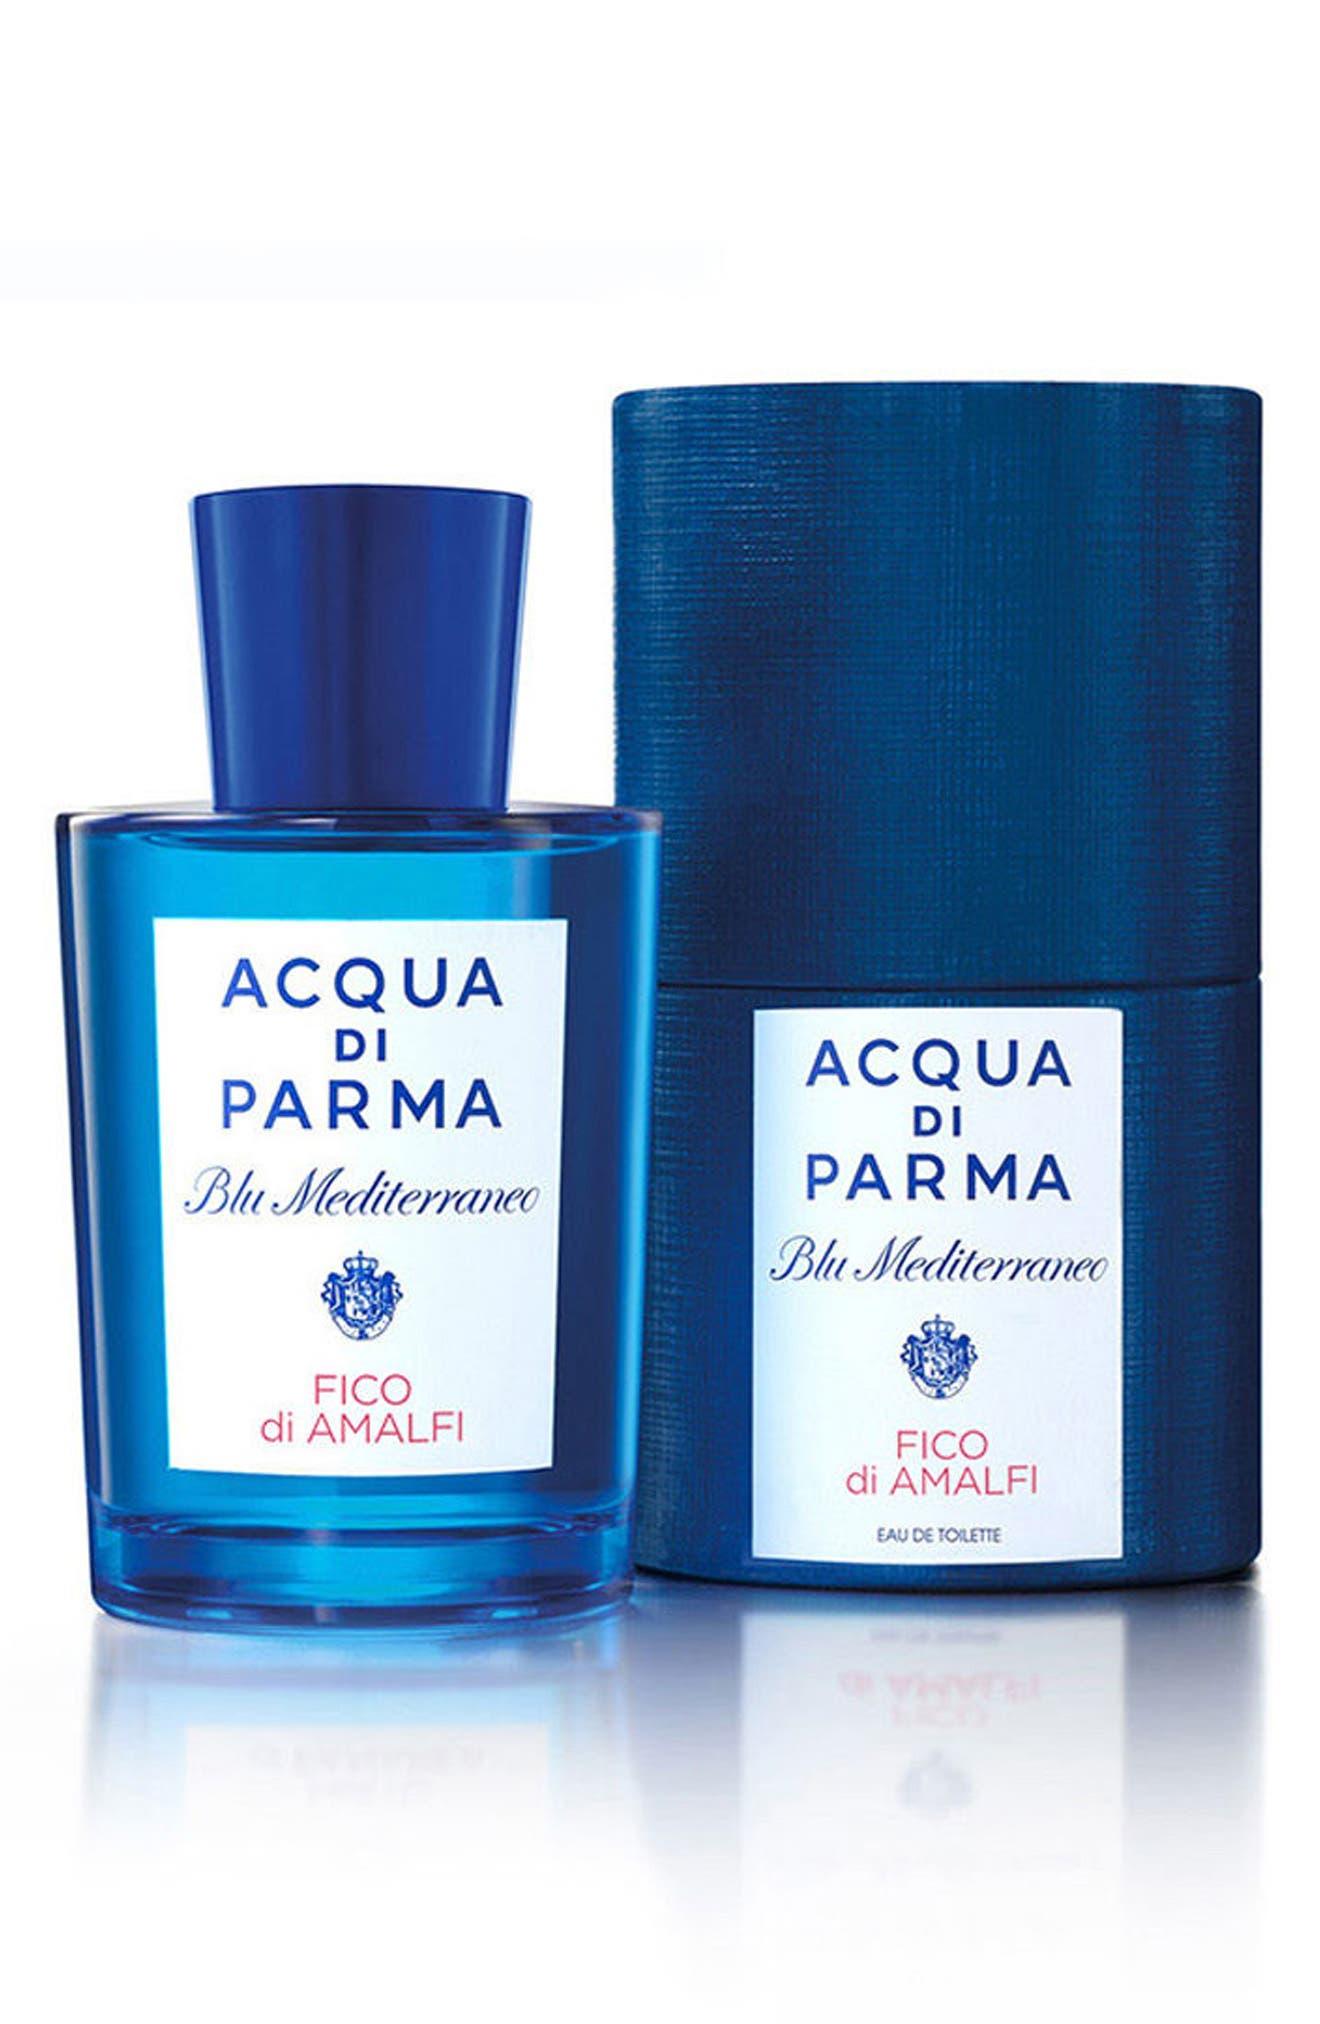 Alternate Image 2  - Acqua di Parma 'Blu Mediterraneo' Fico di Amalfi Eau de Toilette Spray